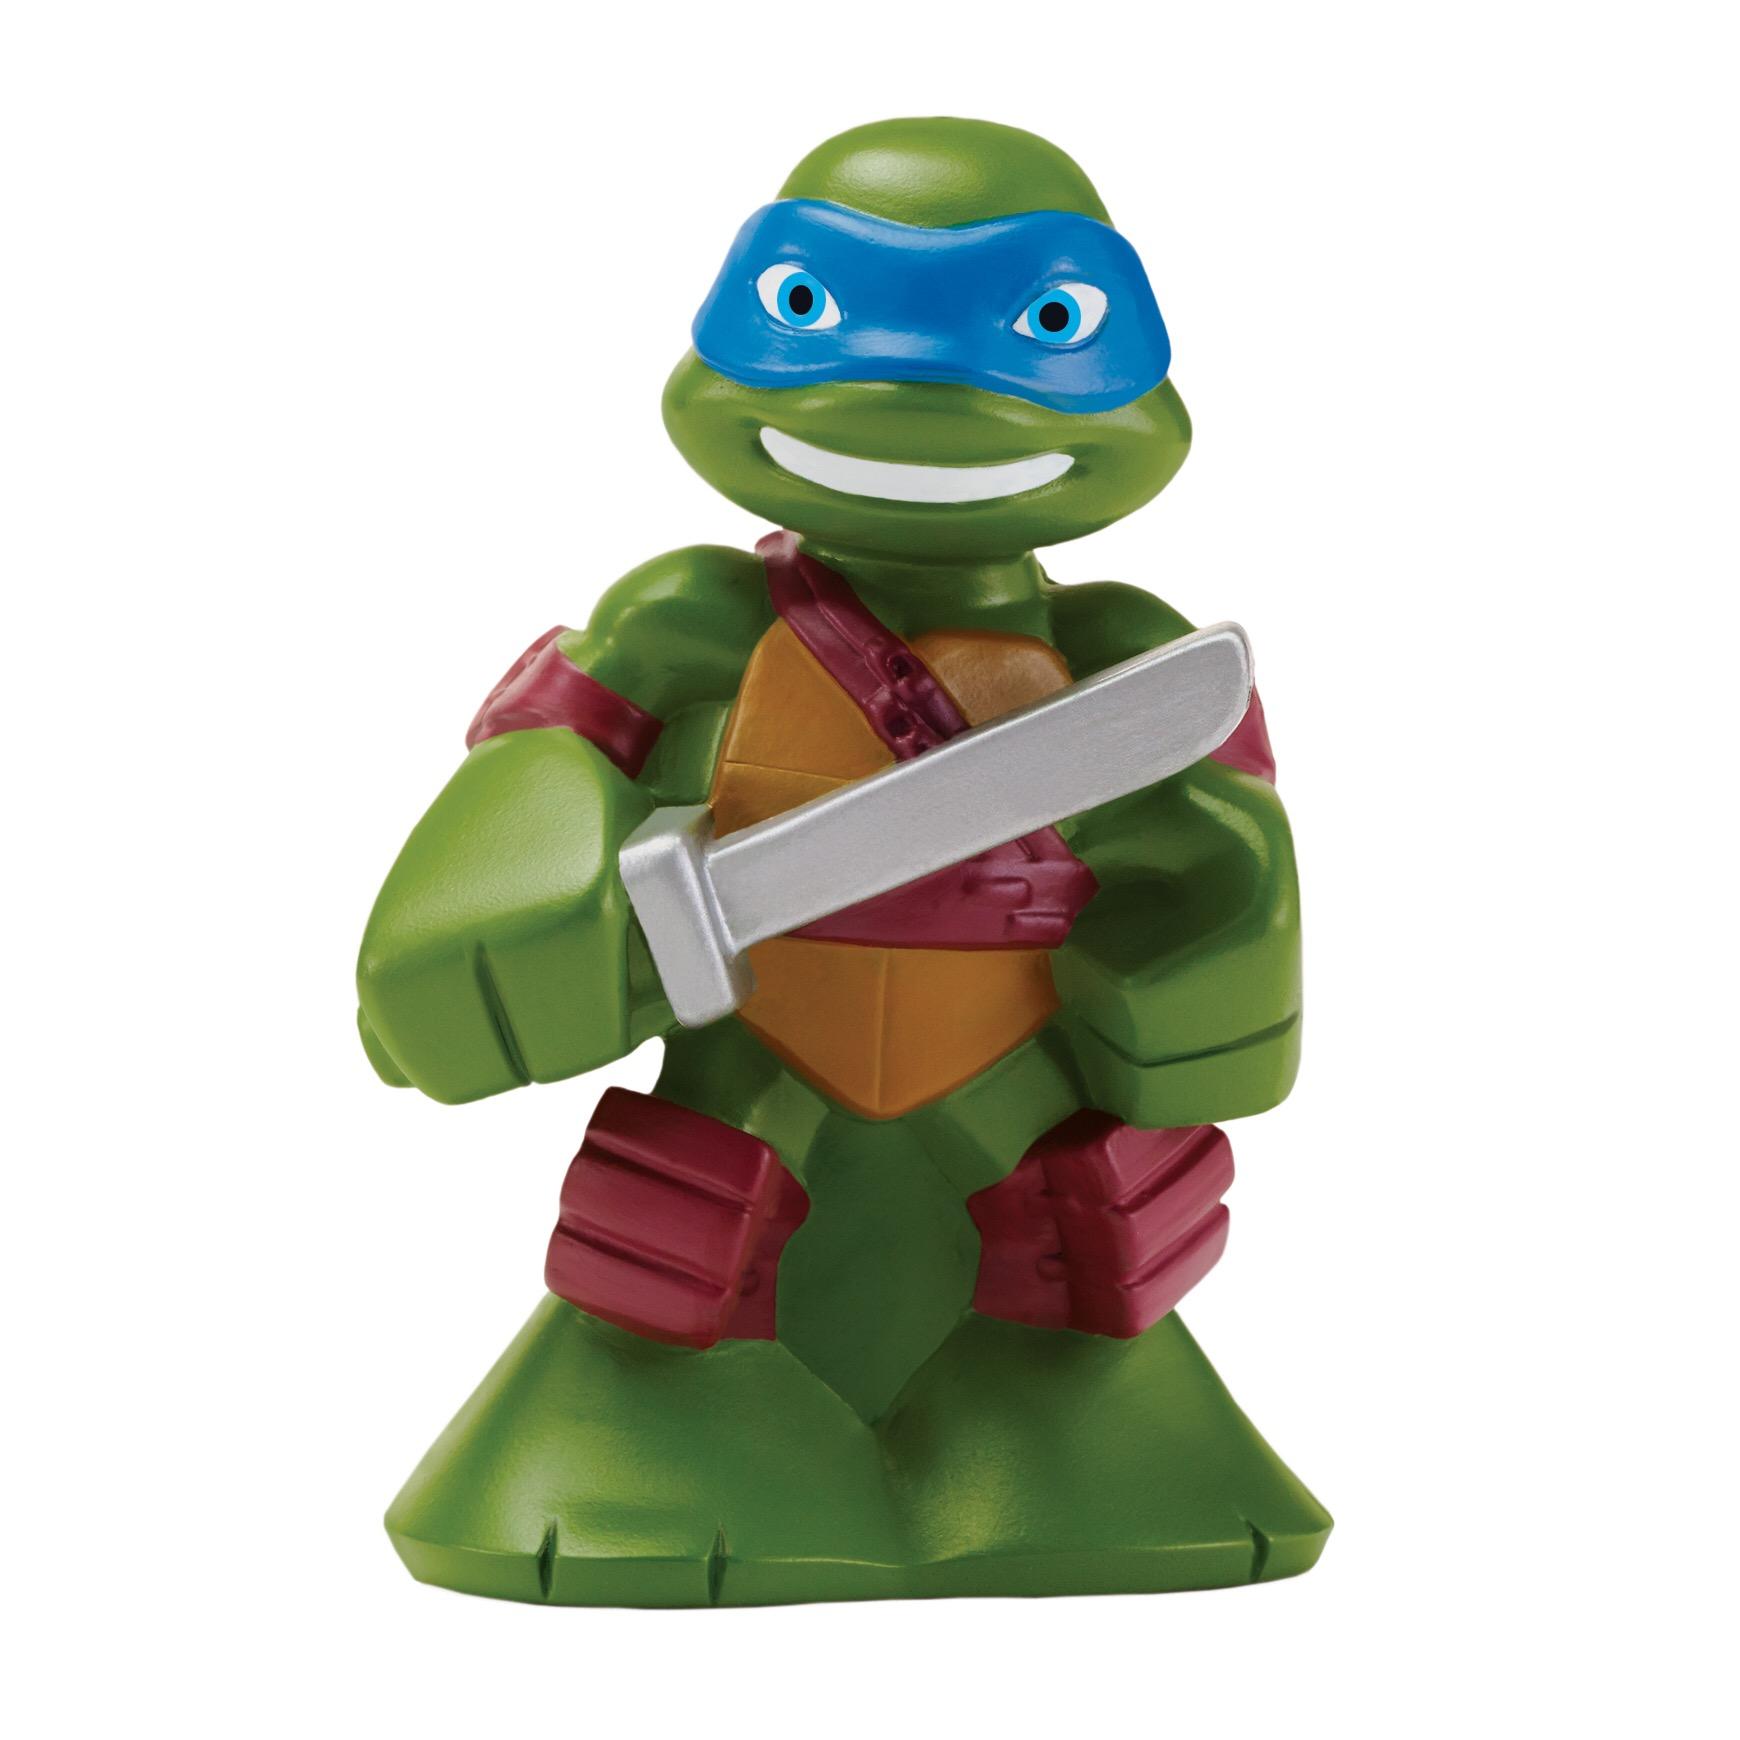 Teenage Mutant Ninja Turtles Half Shell Heroes Bath Squirter Figure Raphael Toy